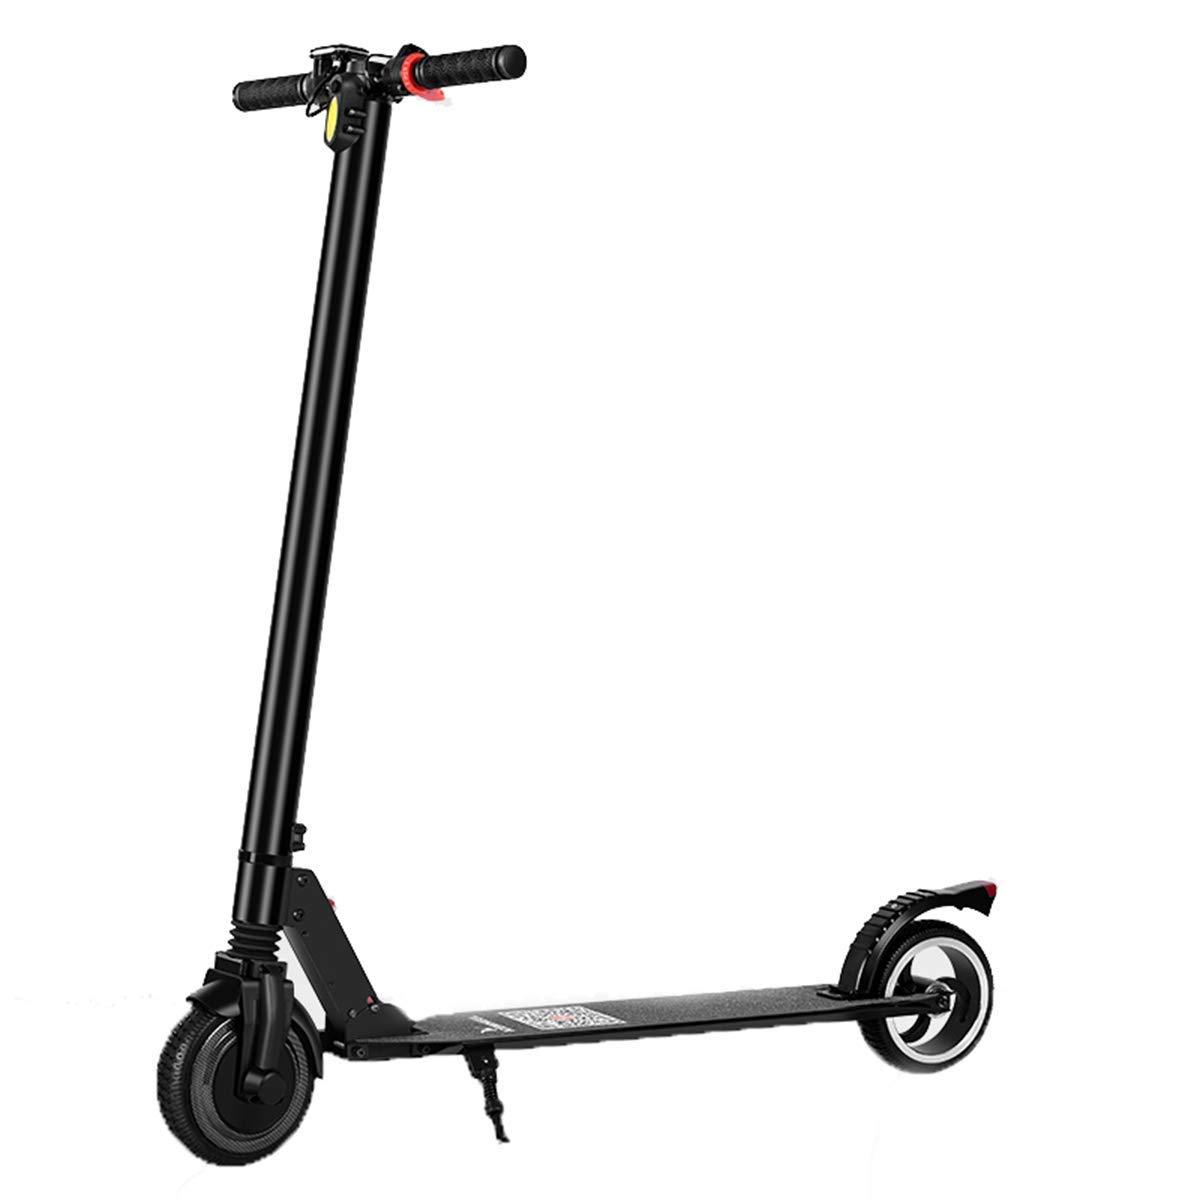 KPLMⓇ Scooter eléctrico Ligero Plegable con luz led y ...